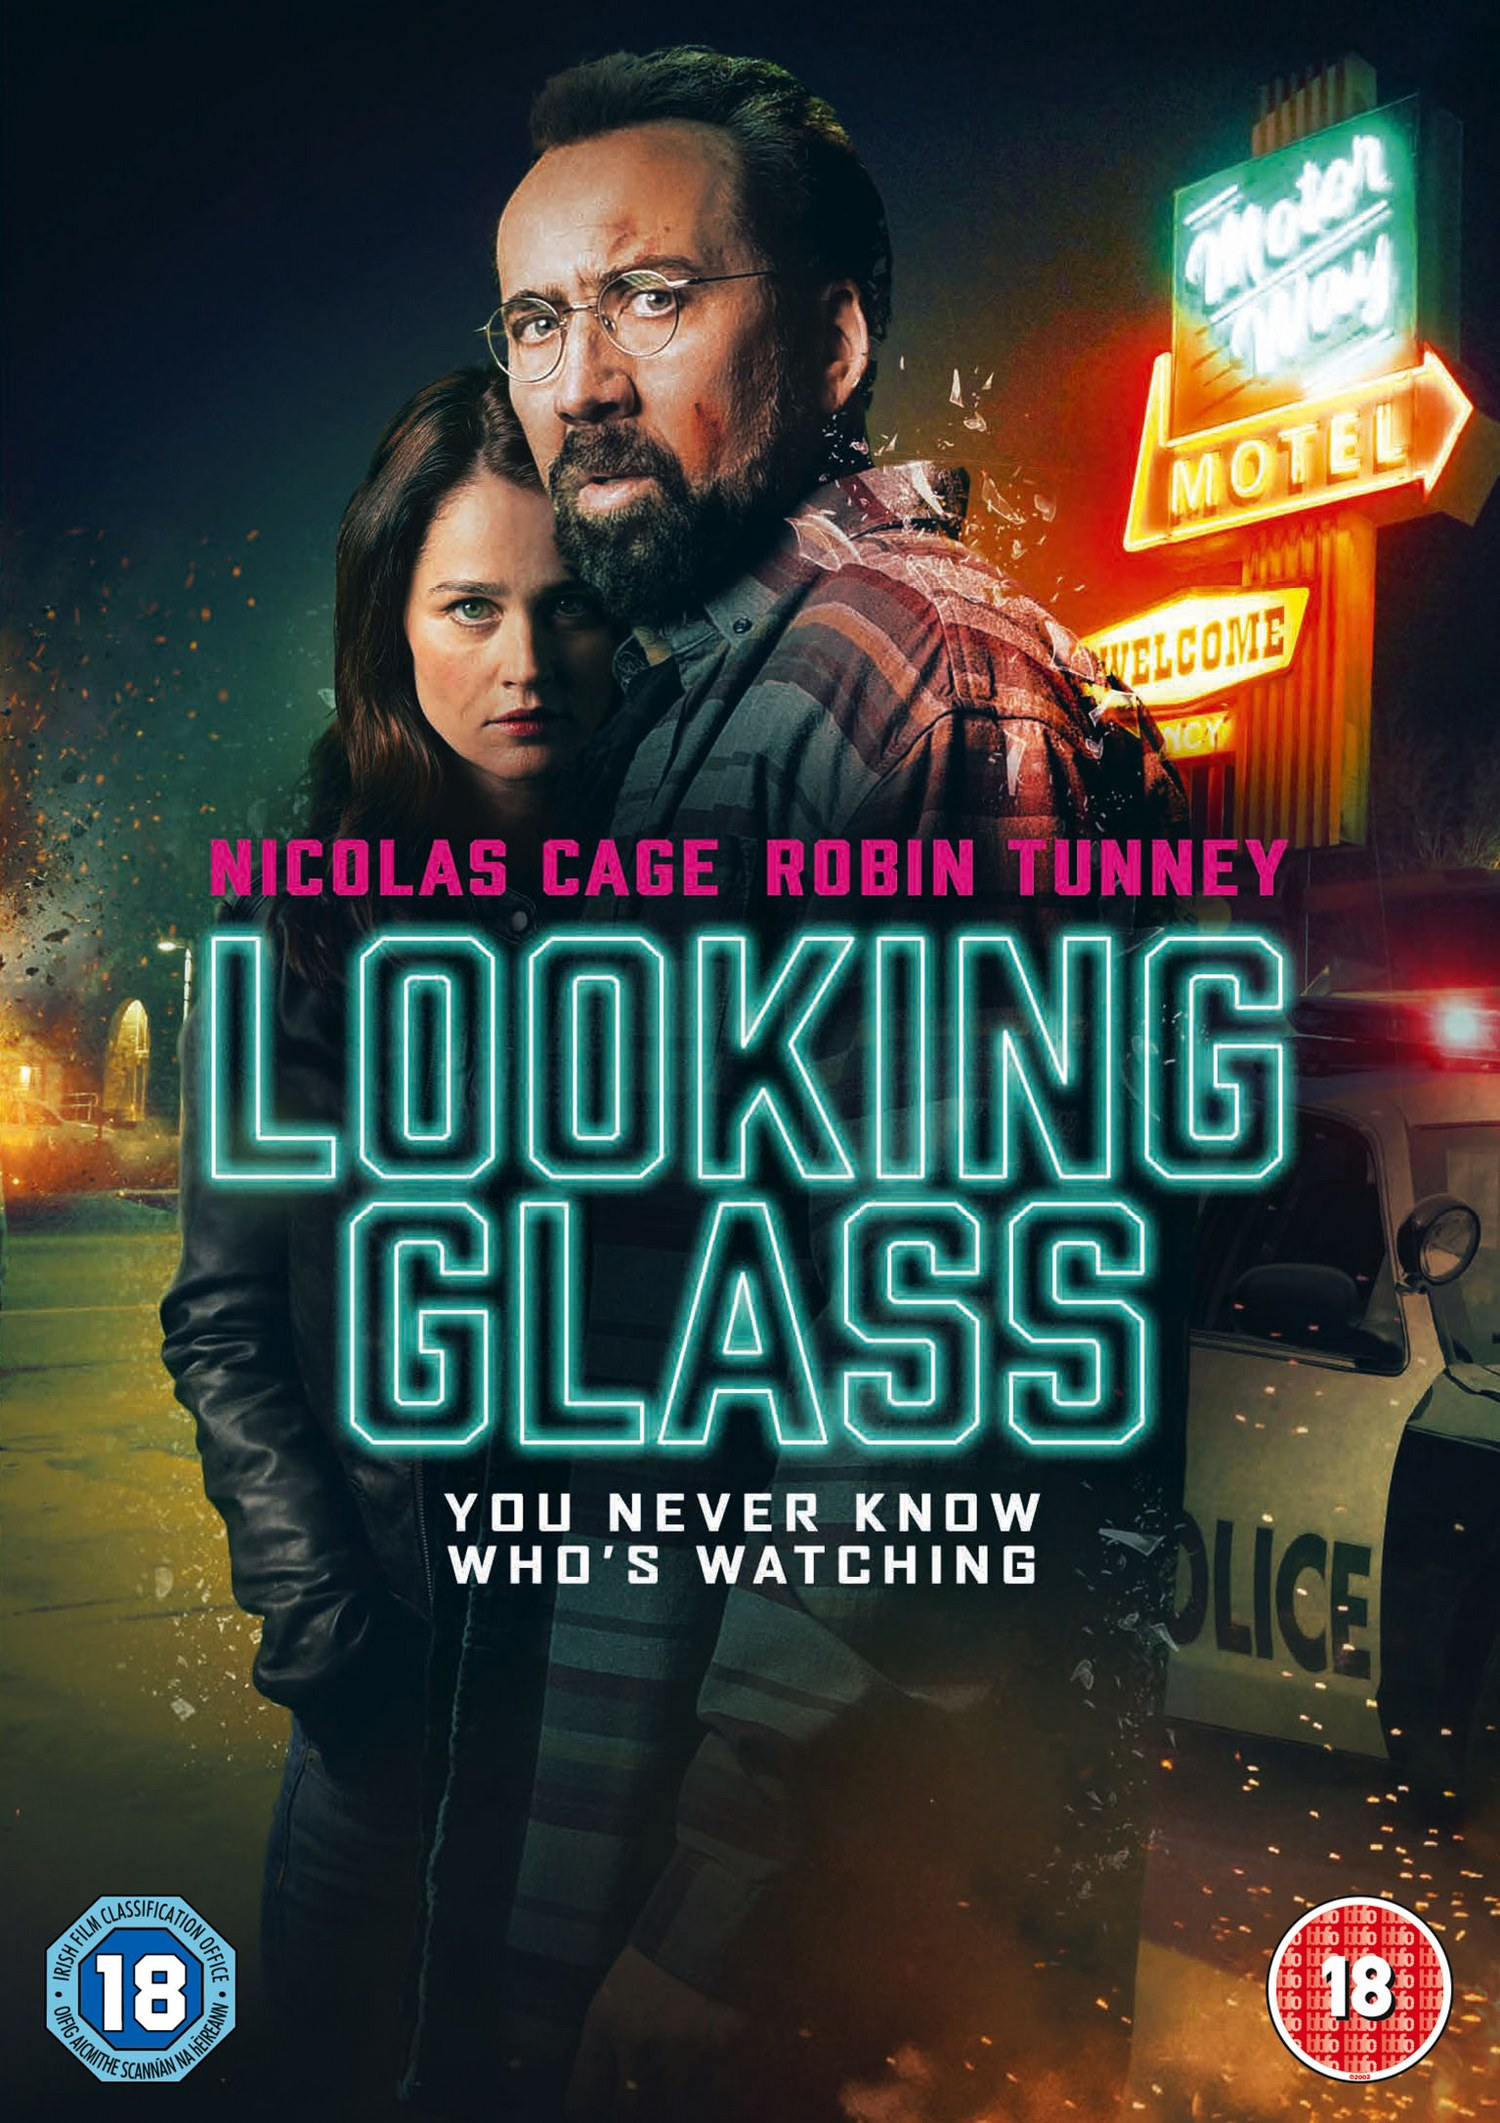 LOOKING_GLASS_2D_DVD